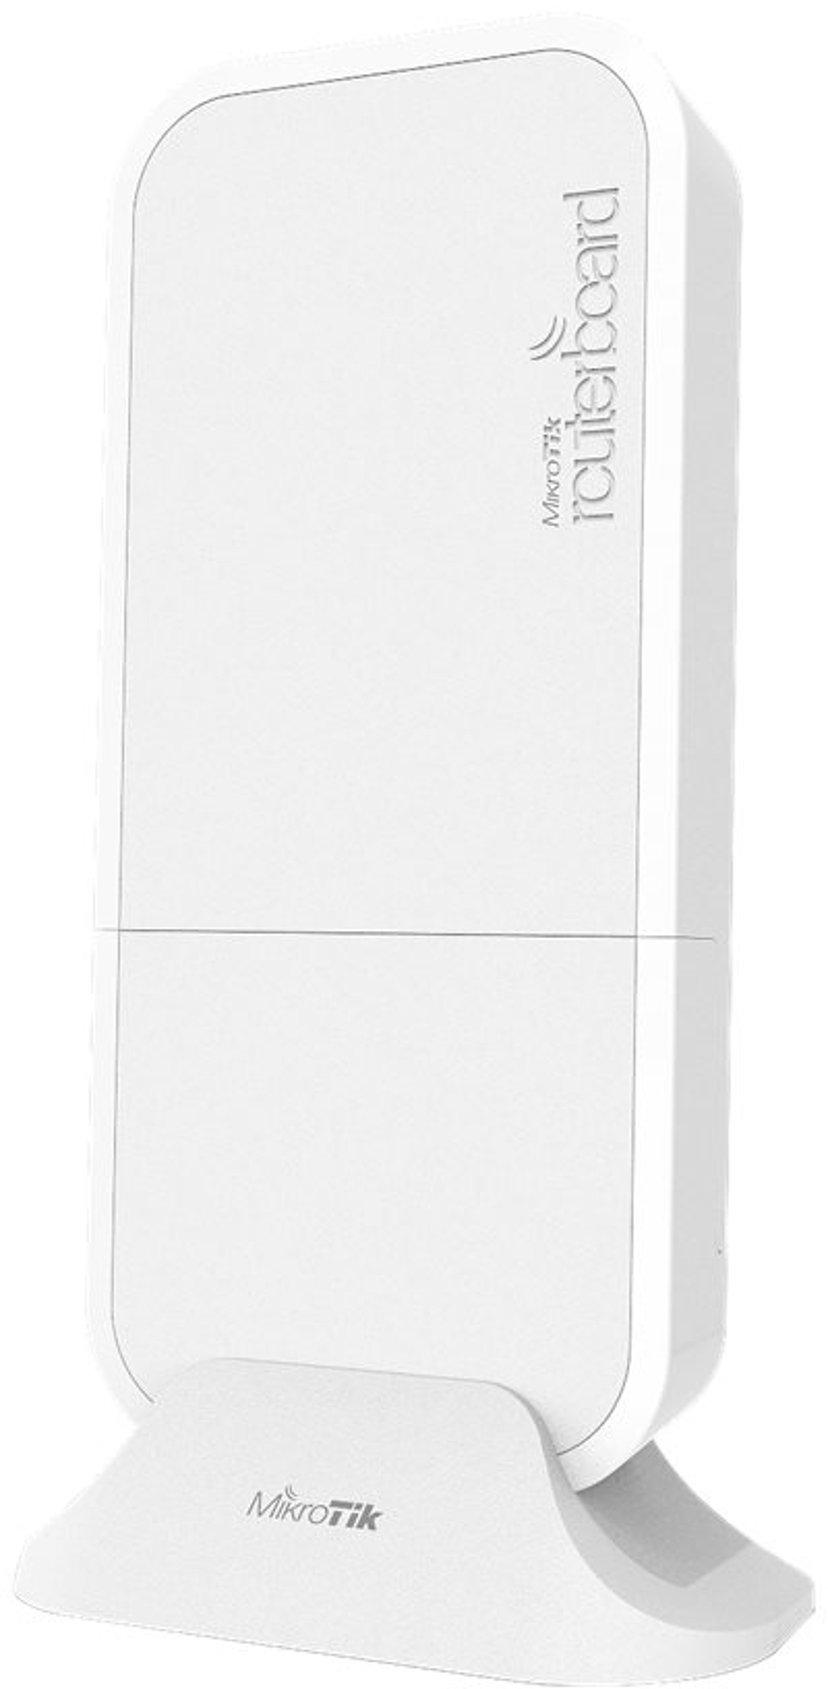 Mikrotik wAP 60G 60 GHz